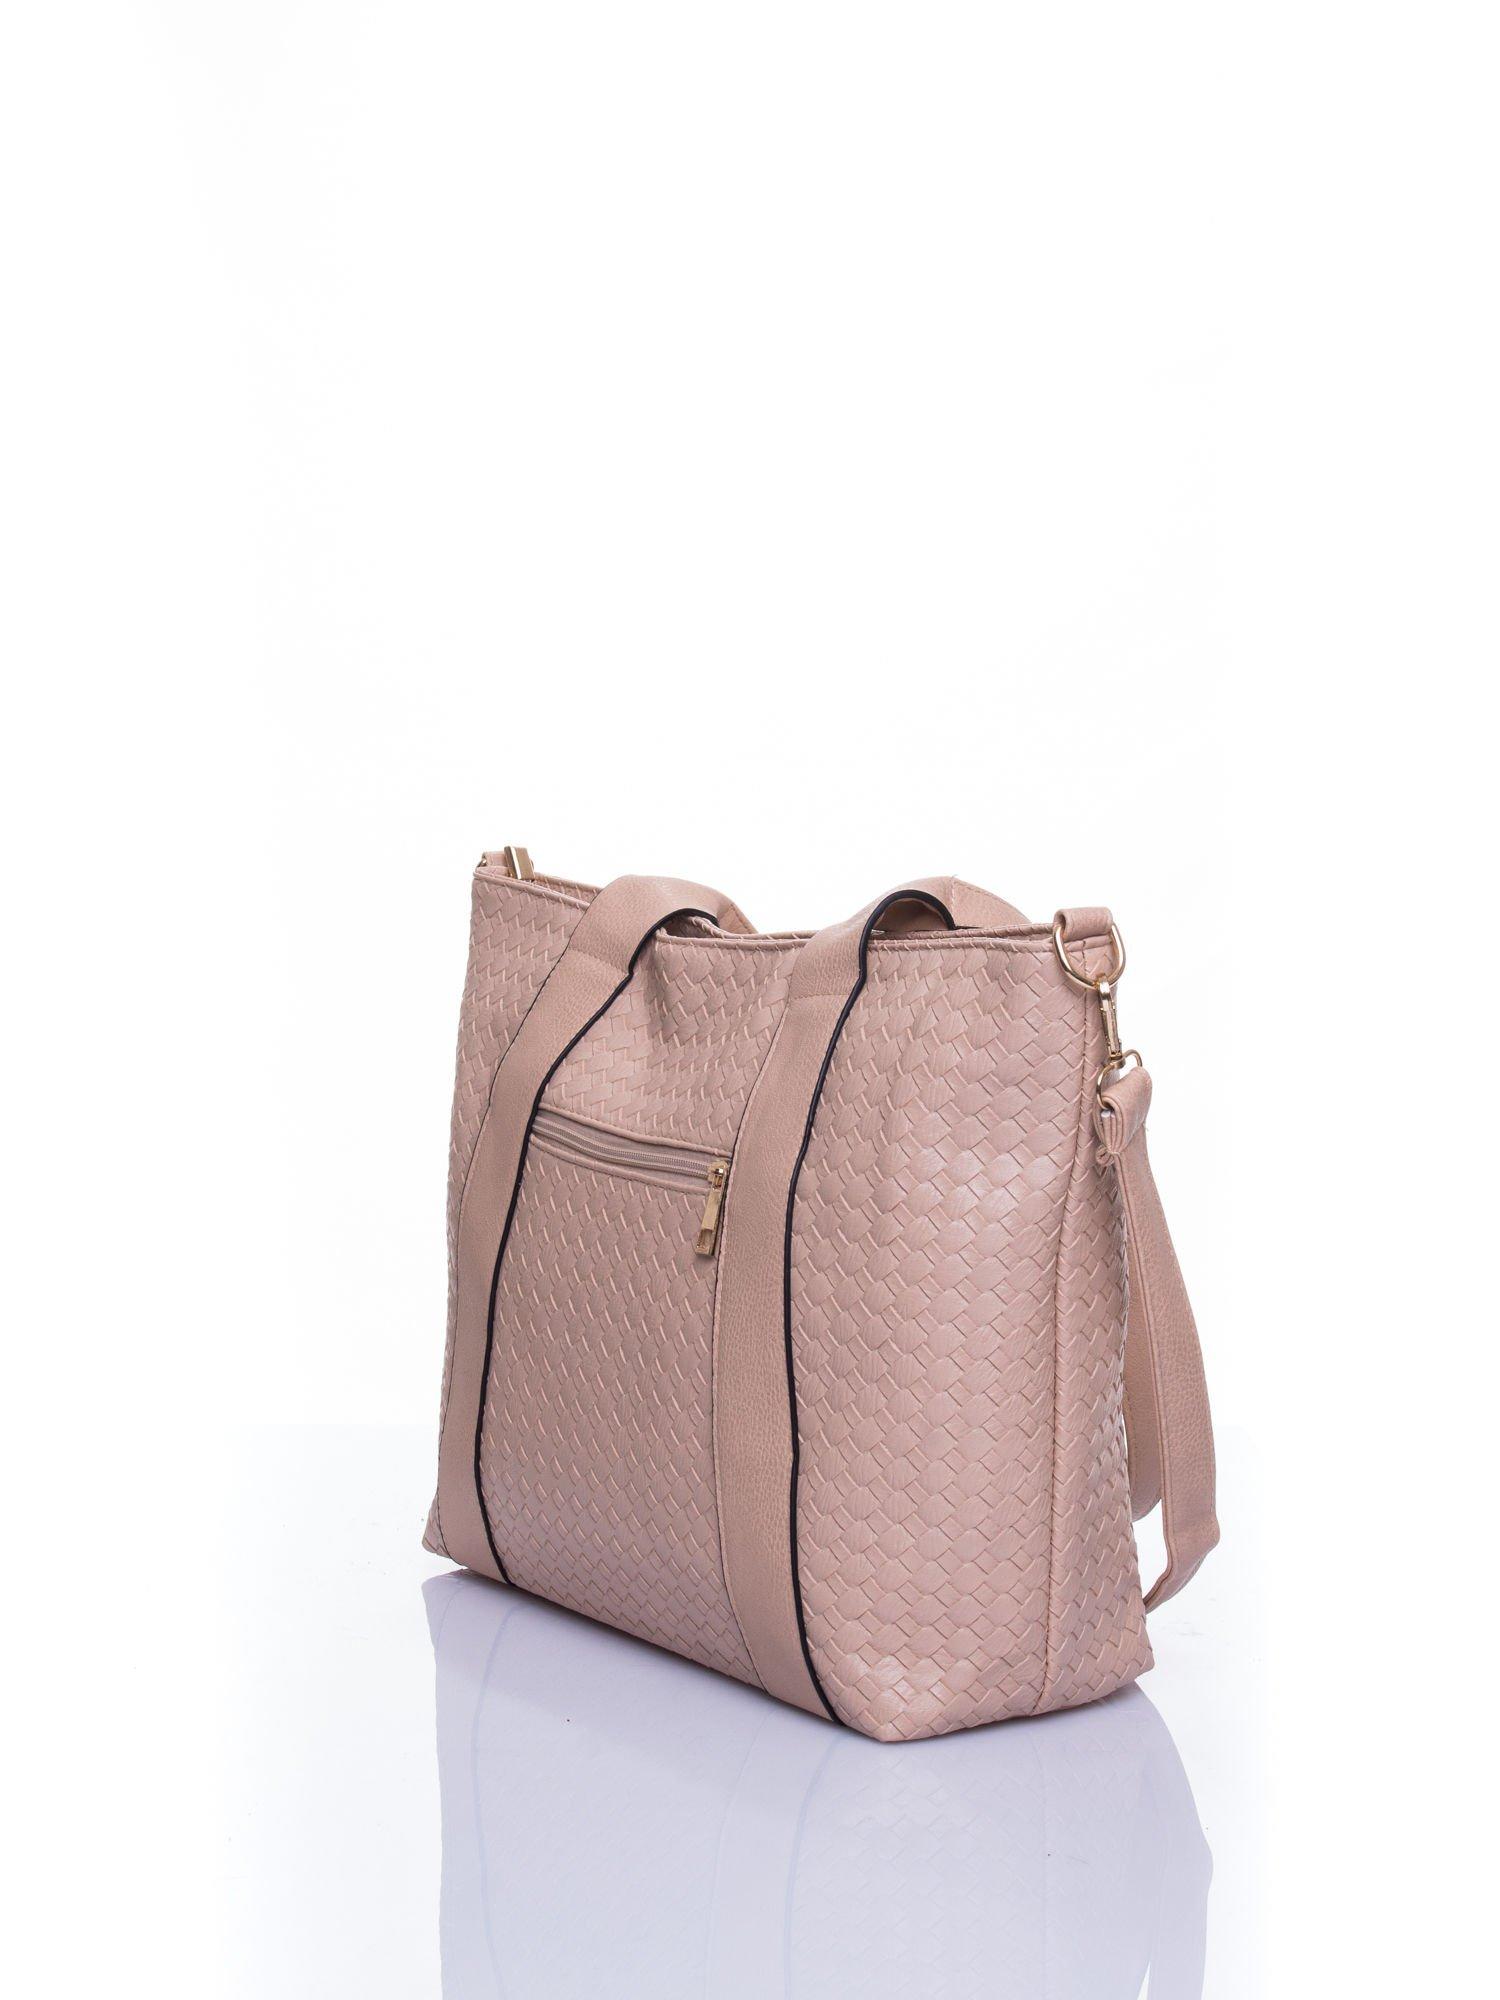 Beżowa pleciona torebka z suwakami                                  zdj.                                  4